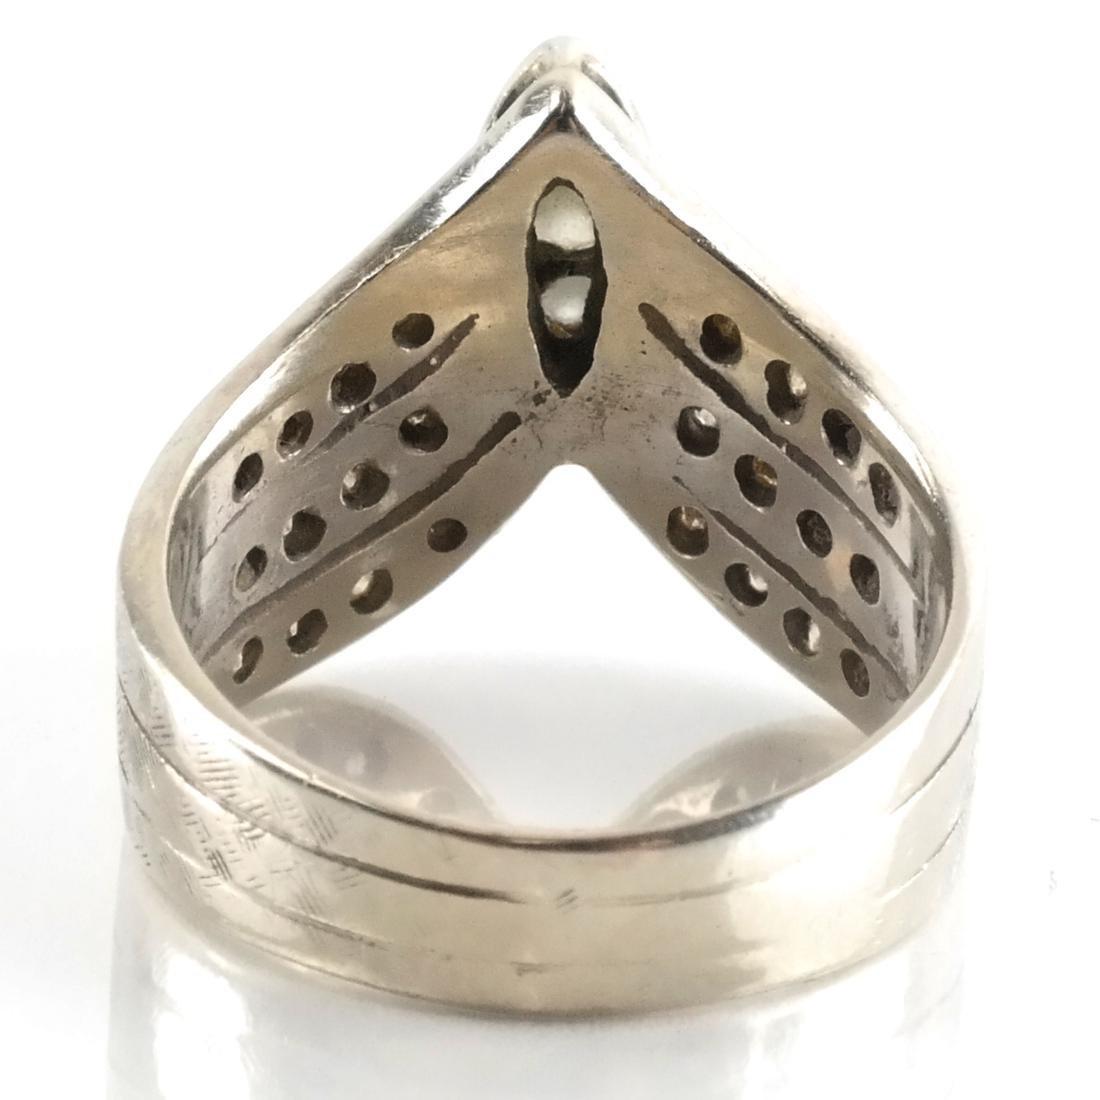 14k WG & Diamond Cocktail Ring - 3